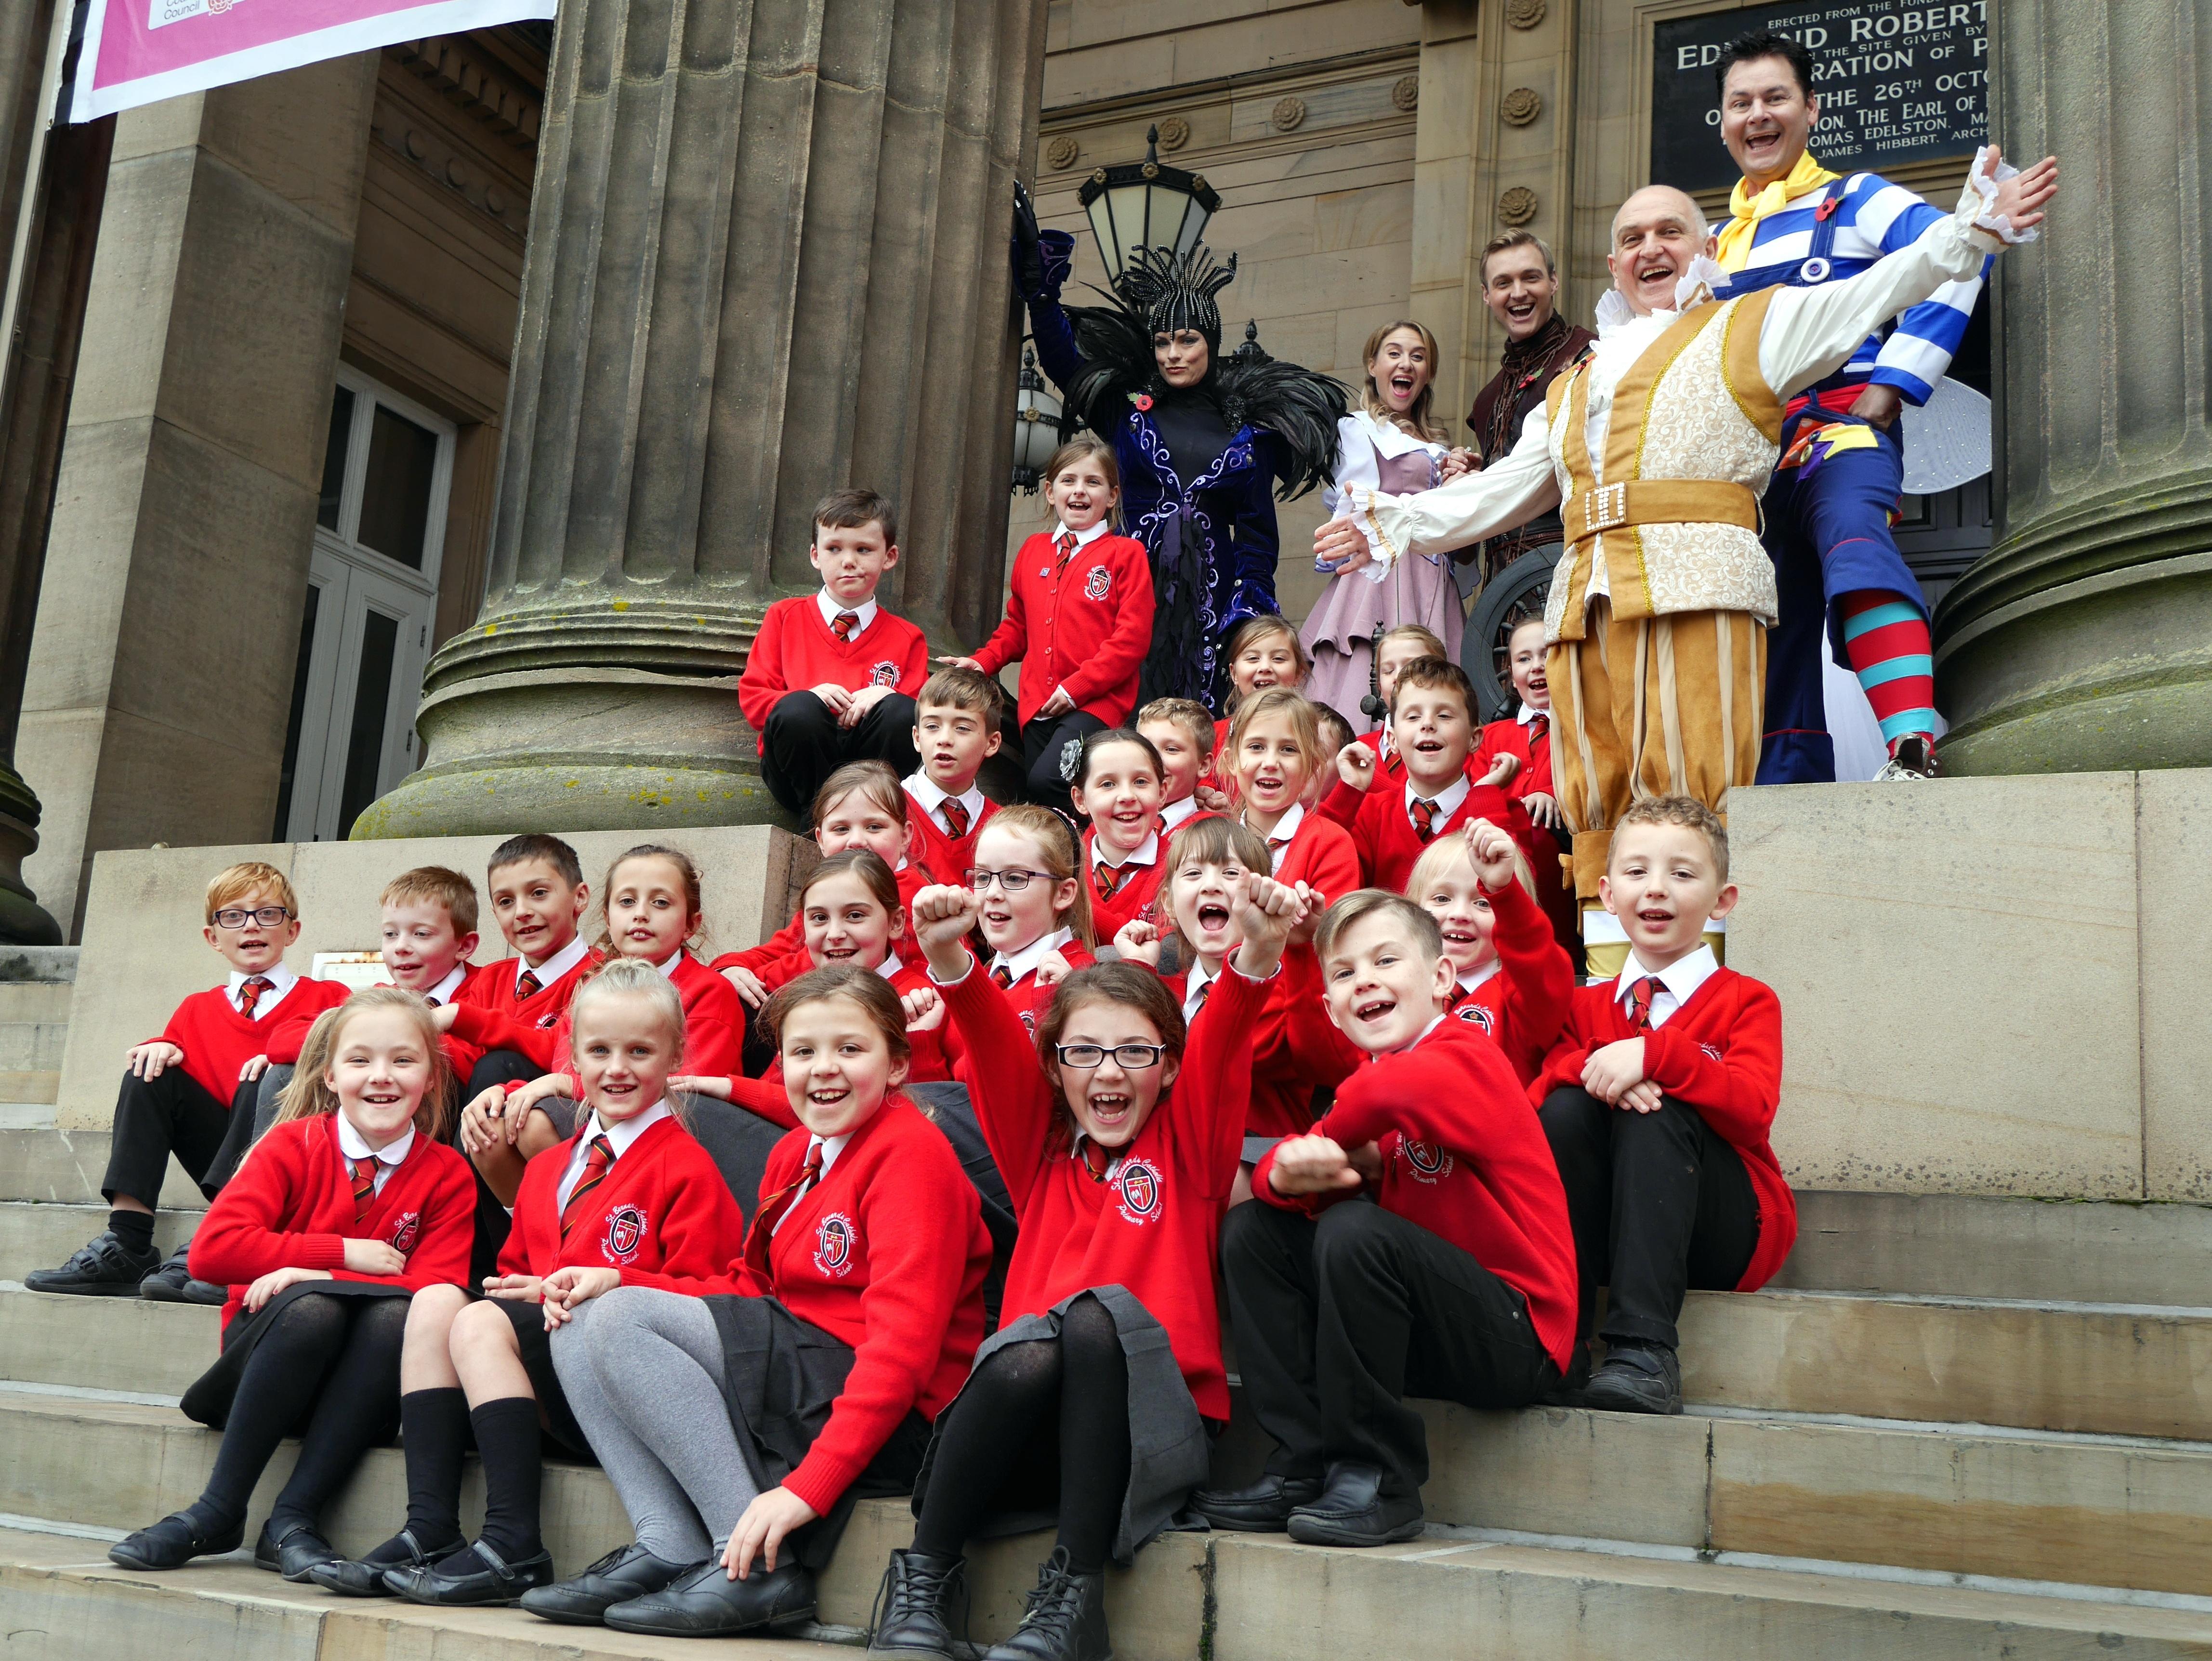 Pupils of St. Bernard's Catholic Primary School, Lea, Preston on the Harris balcony steps with the cast of Sleeping Beauty